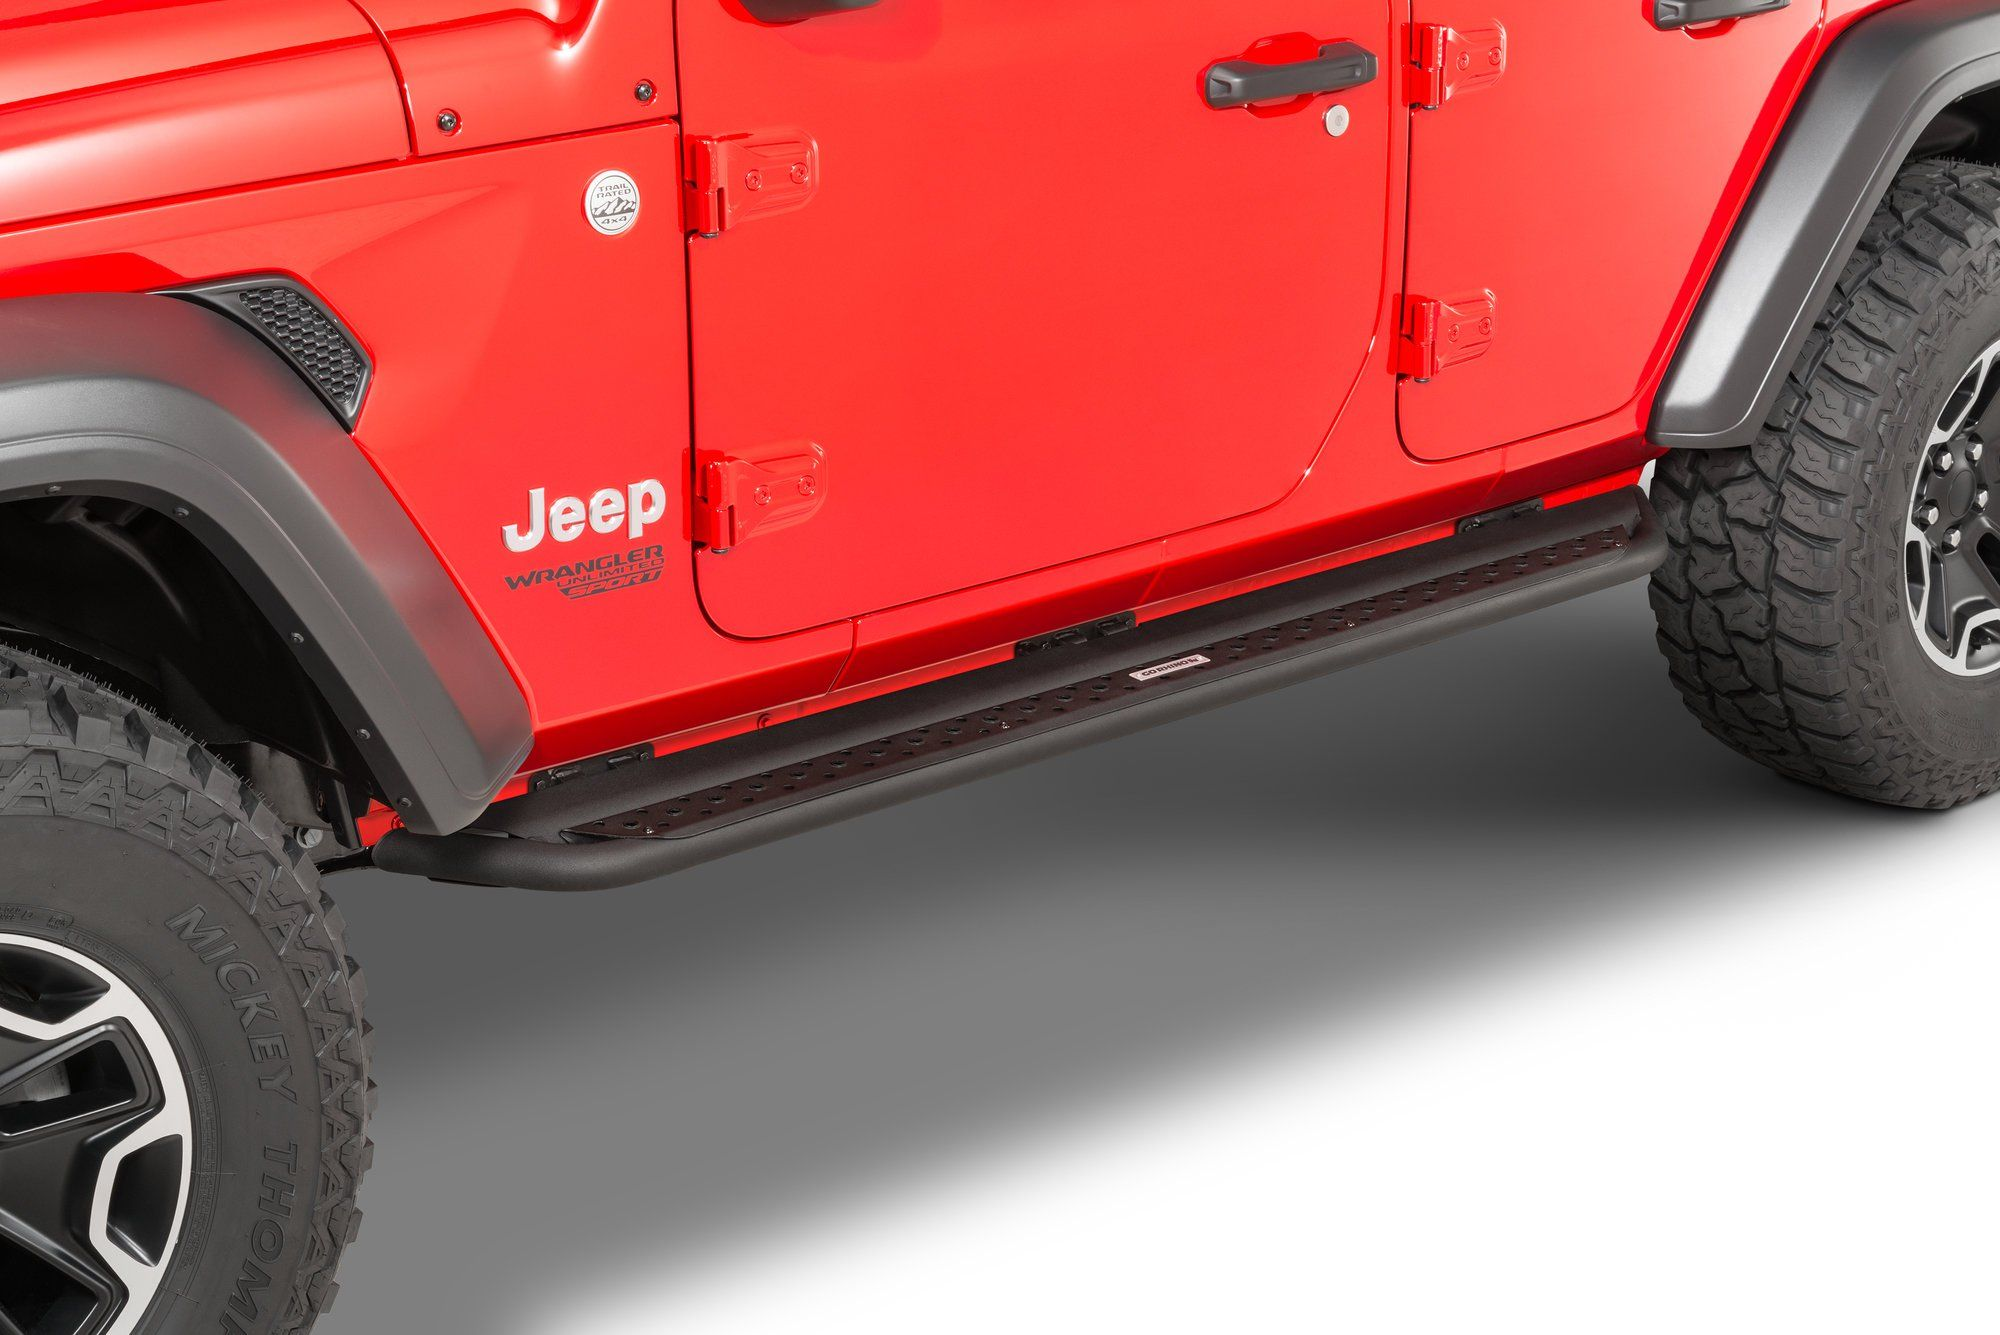 Go Rhino Dss4506t Dominator Dss Rock Sliders For 18 20 Jeep Wrangler Jl Unlimited Jeep Wrangler Wrangler Jl Jeep